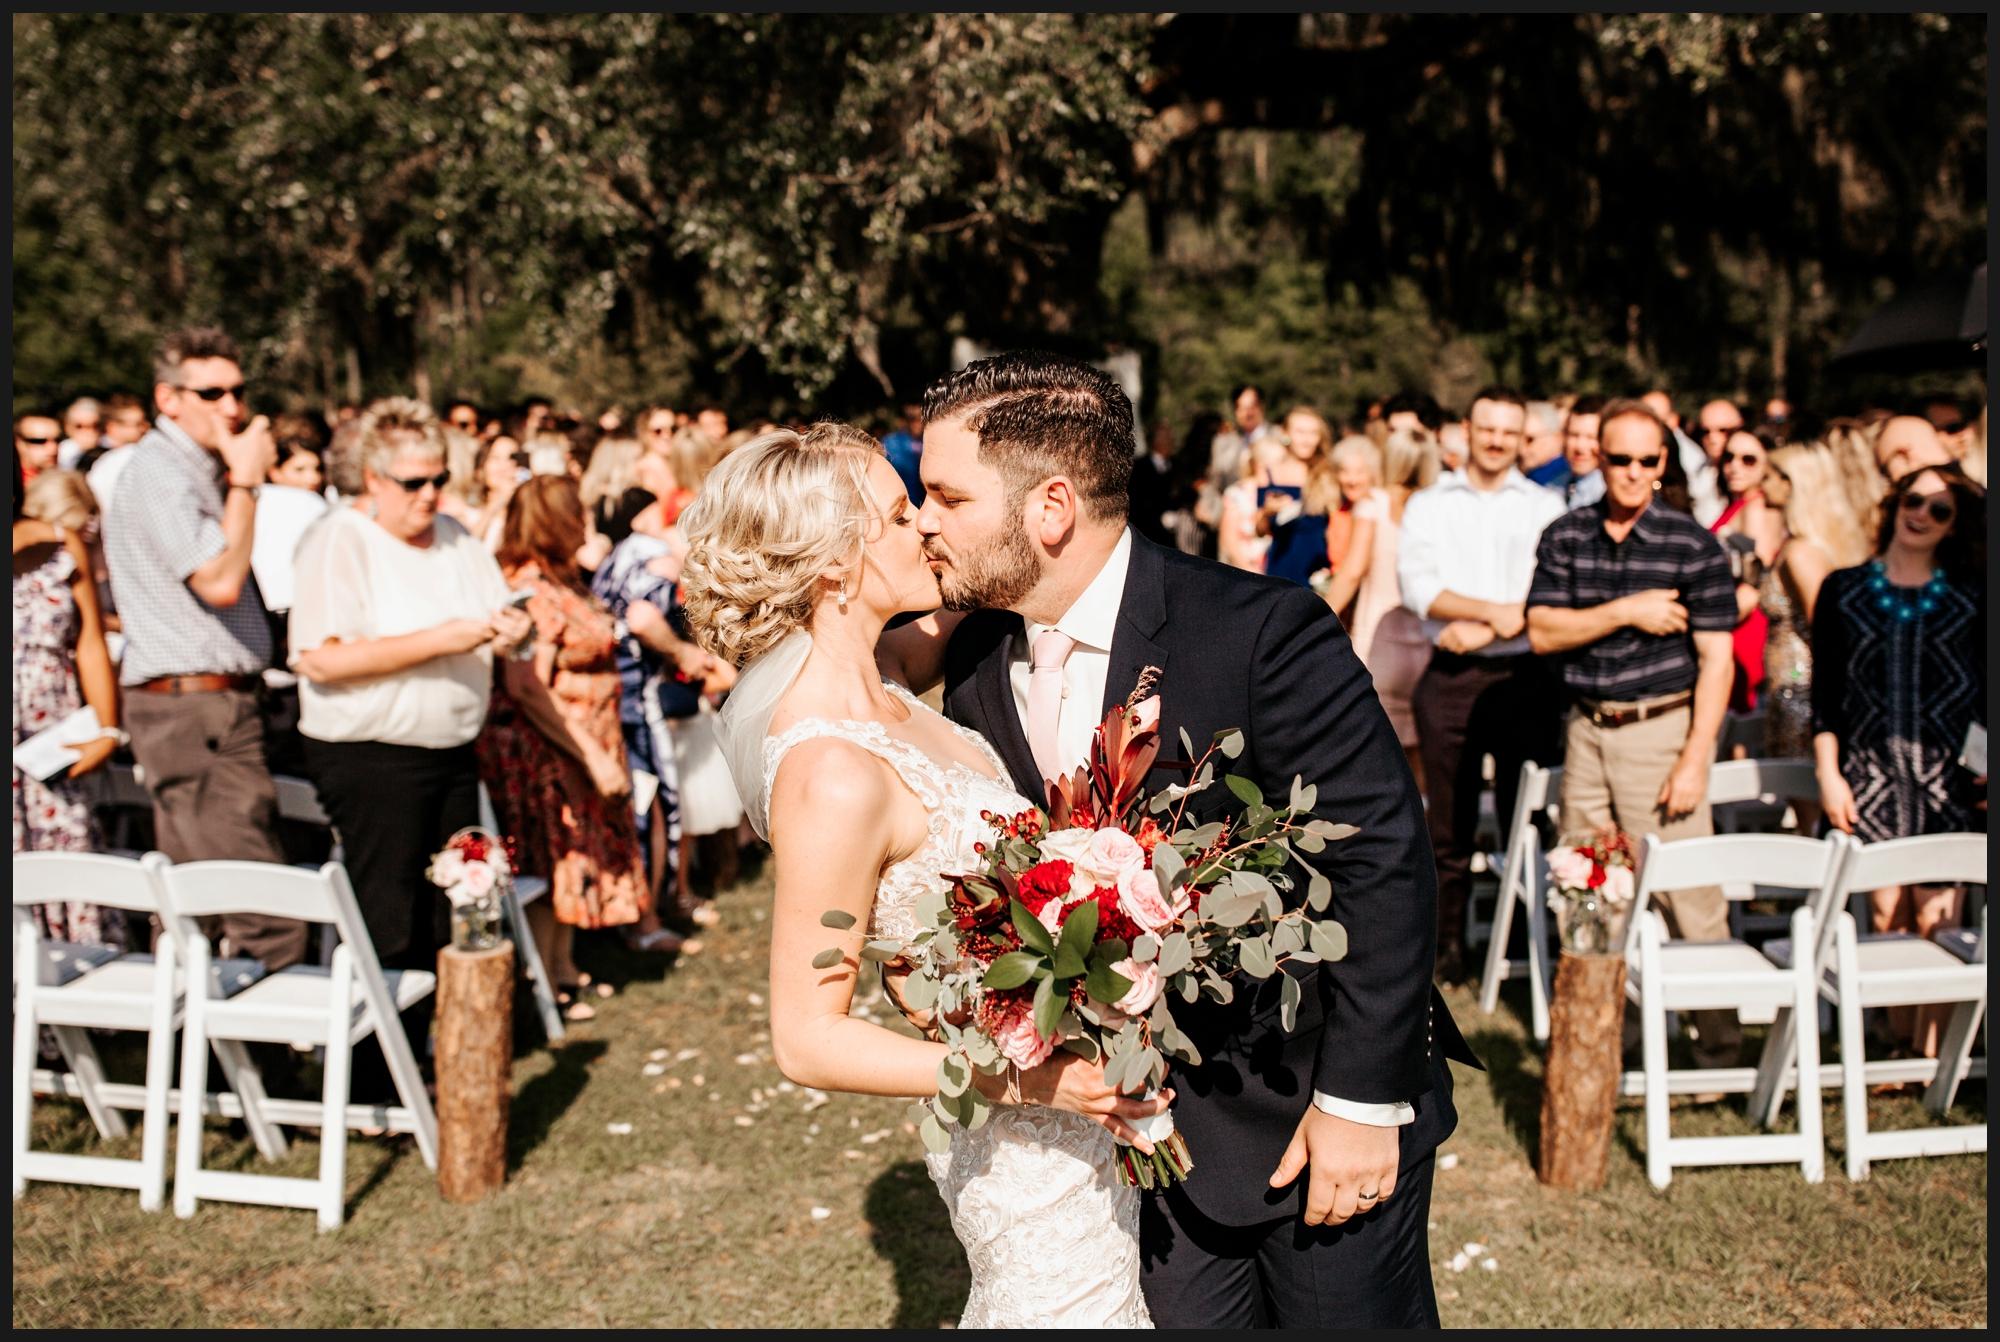 Orlando-Wedding-Photographer-destination-wedding-photographer-florida-wedding-photographer-hawaii-wedding-photographer_0599.jpg